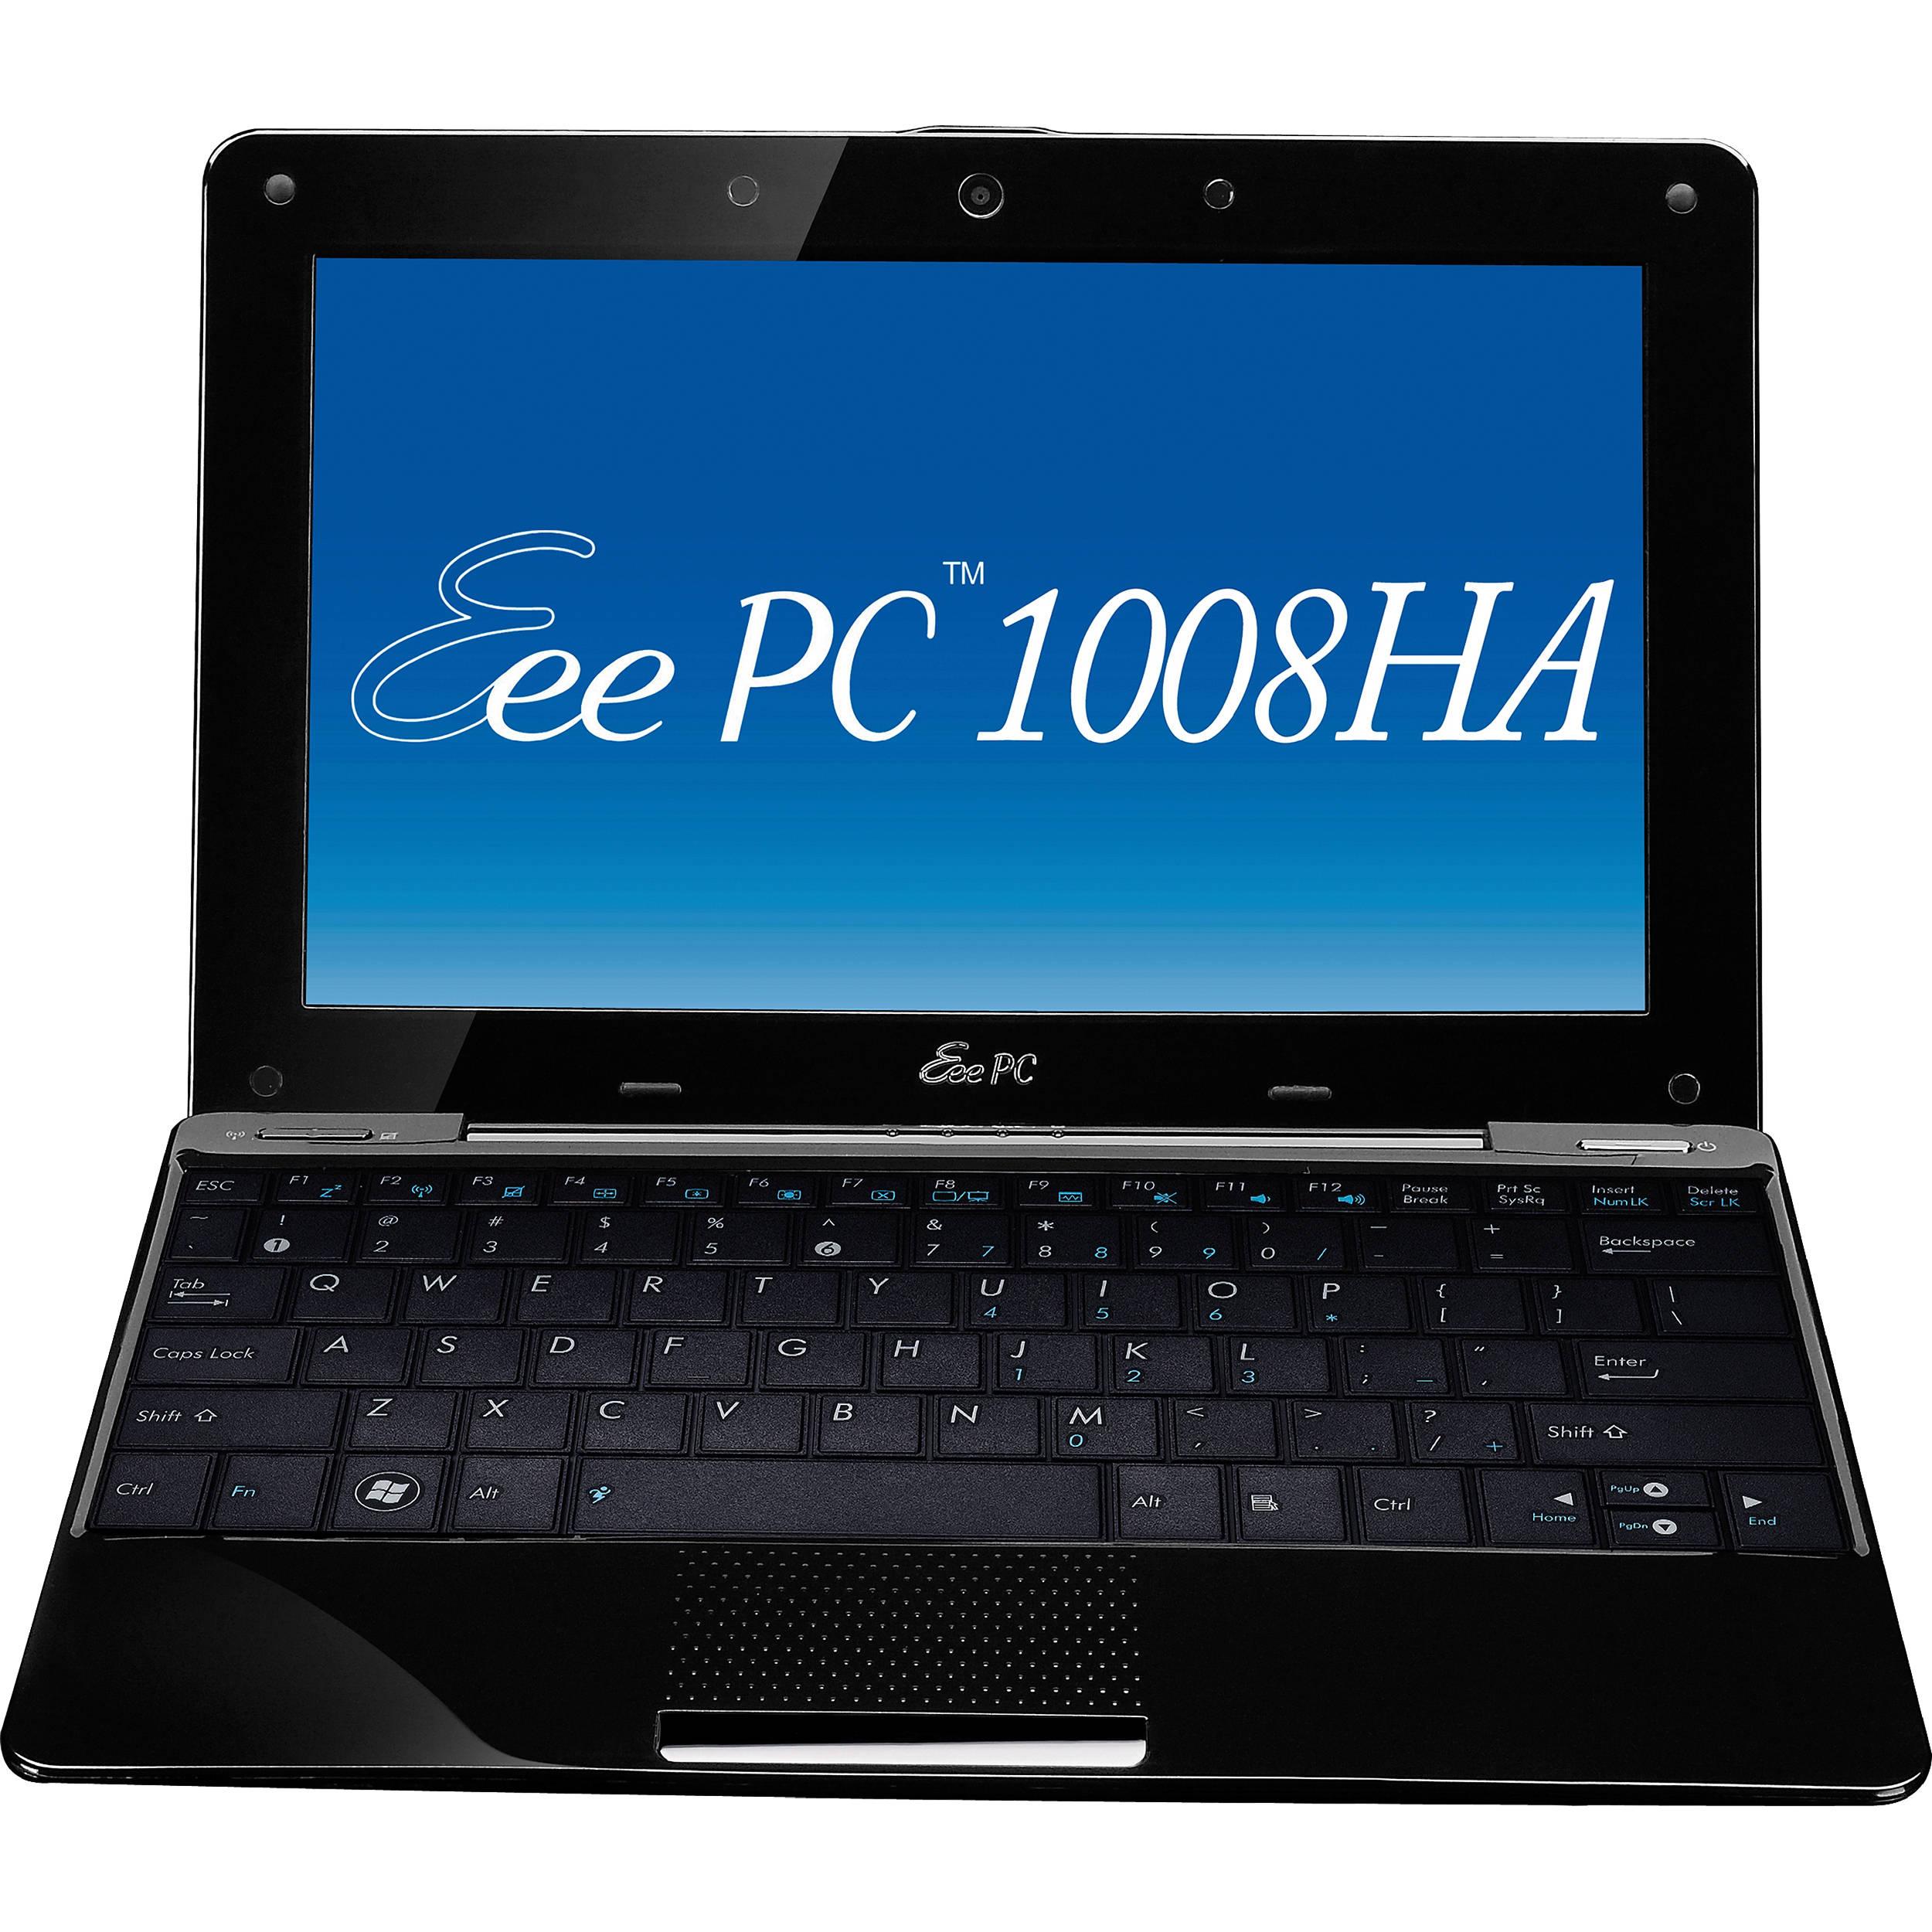 Asus Eee PC 1008HA Seashell Camera Treiber Windows XP